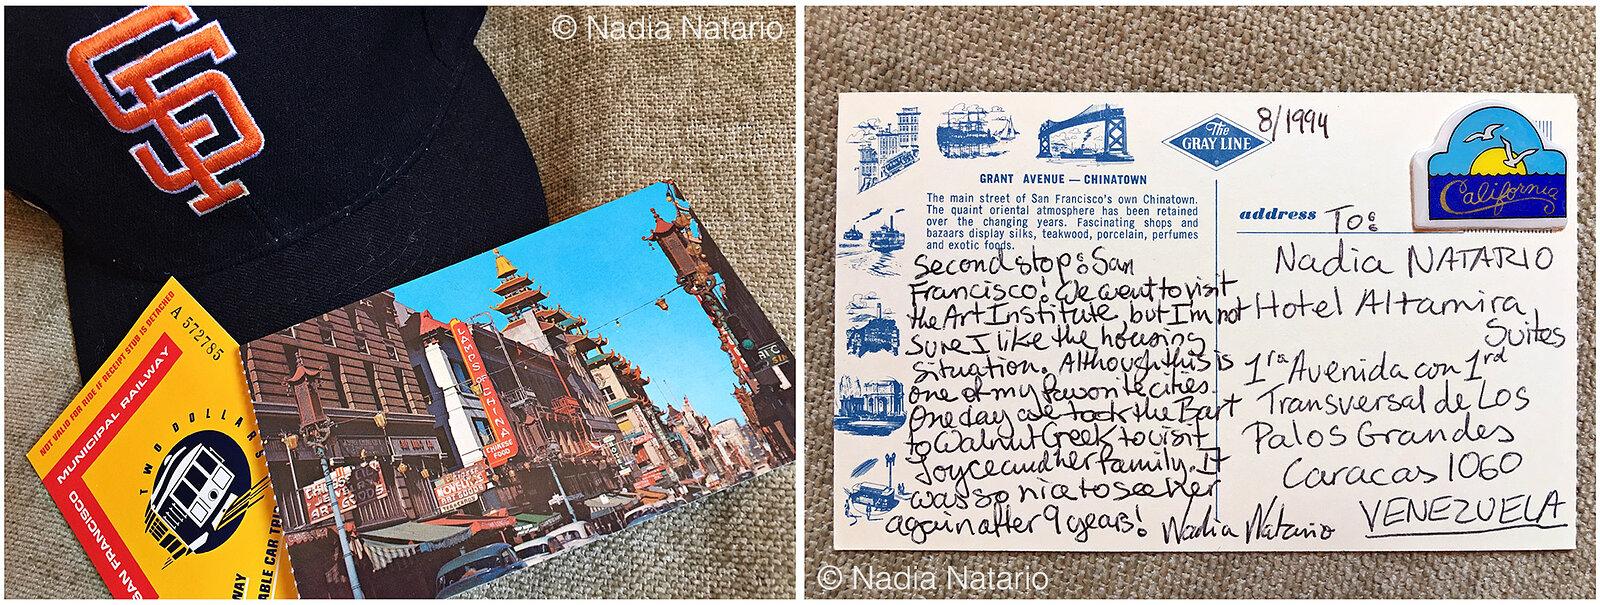 Postcards to Myself - San Francisco, U.S.A, 1994